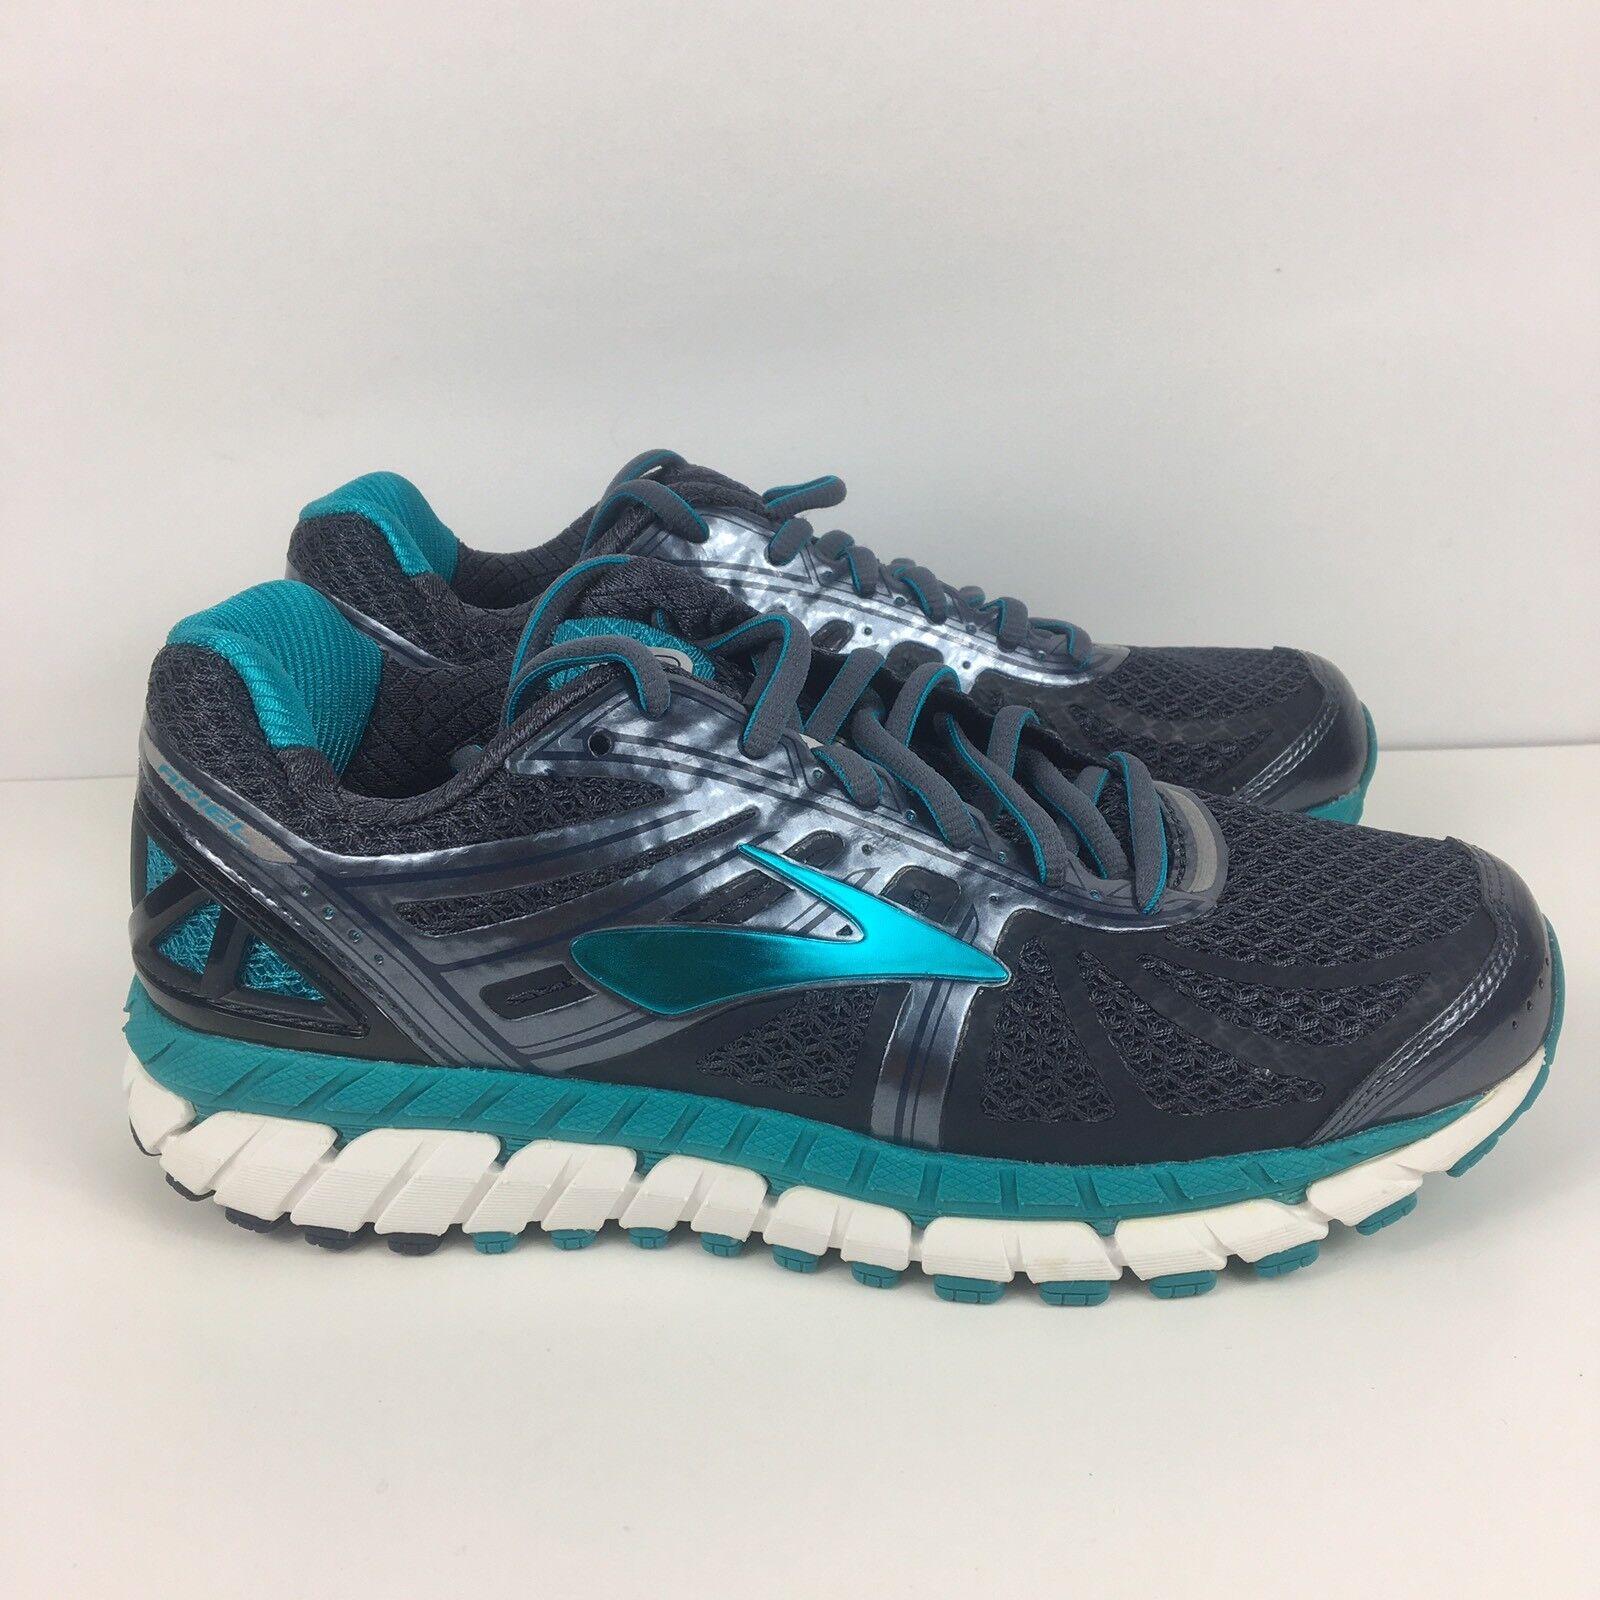 Brooks Brooks Brooks Ariel 16 Women's Size 7 Running shoes bluee Teal New 515e8c